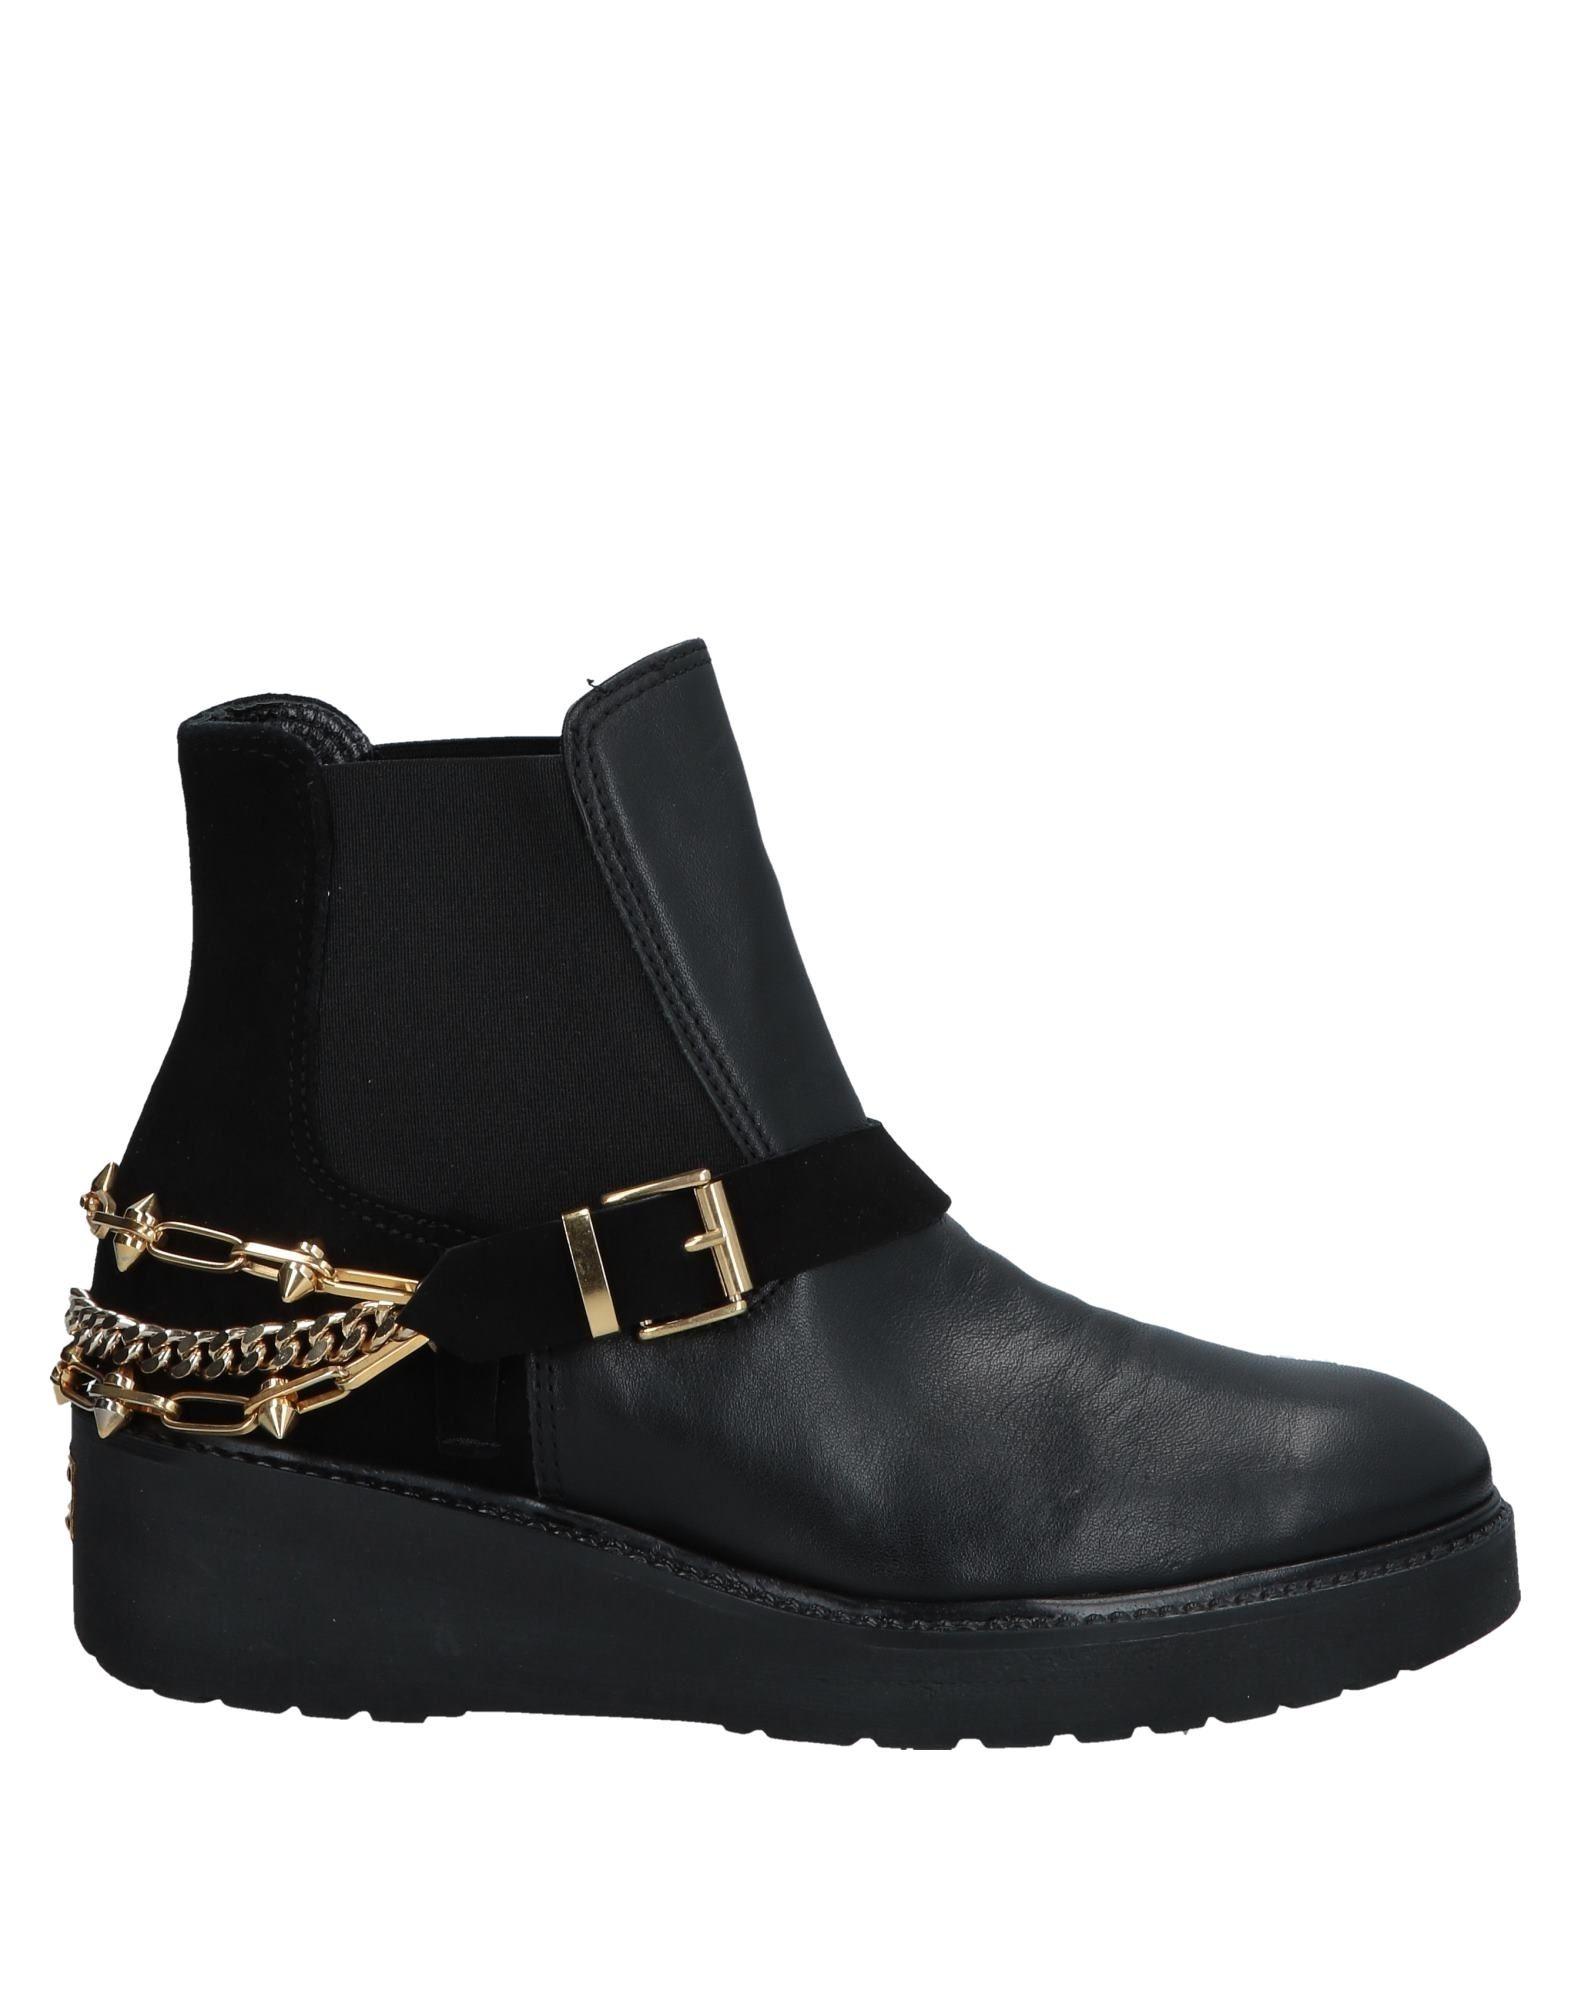 Chiara Ferragni Ankle Boot - Women Chiara Ferragni Ankle Boots - online on  Australia - Boots 11554664KL a0ec7b